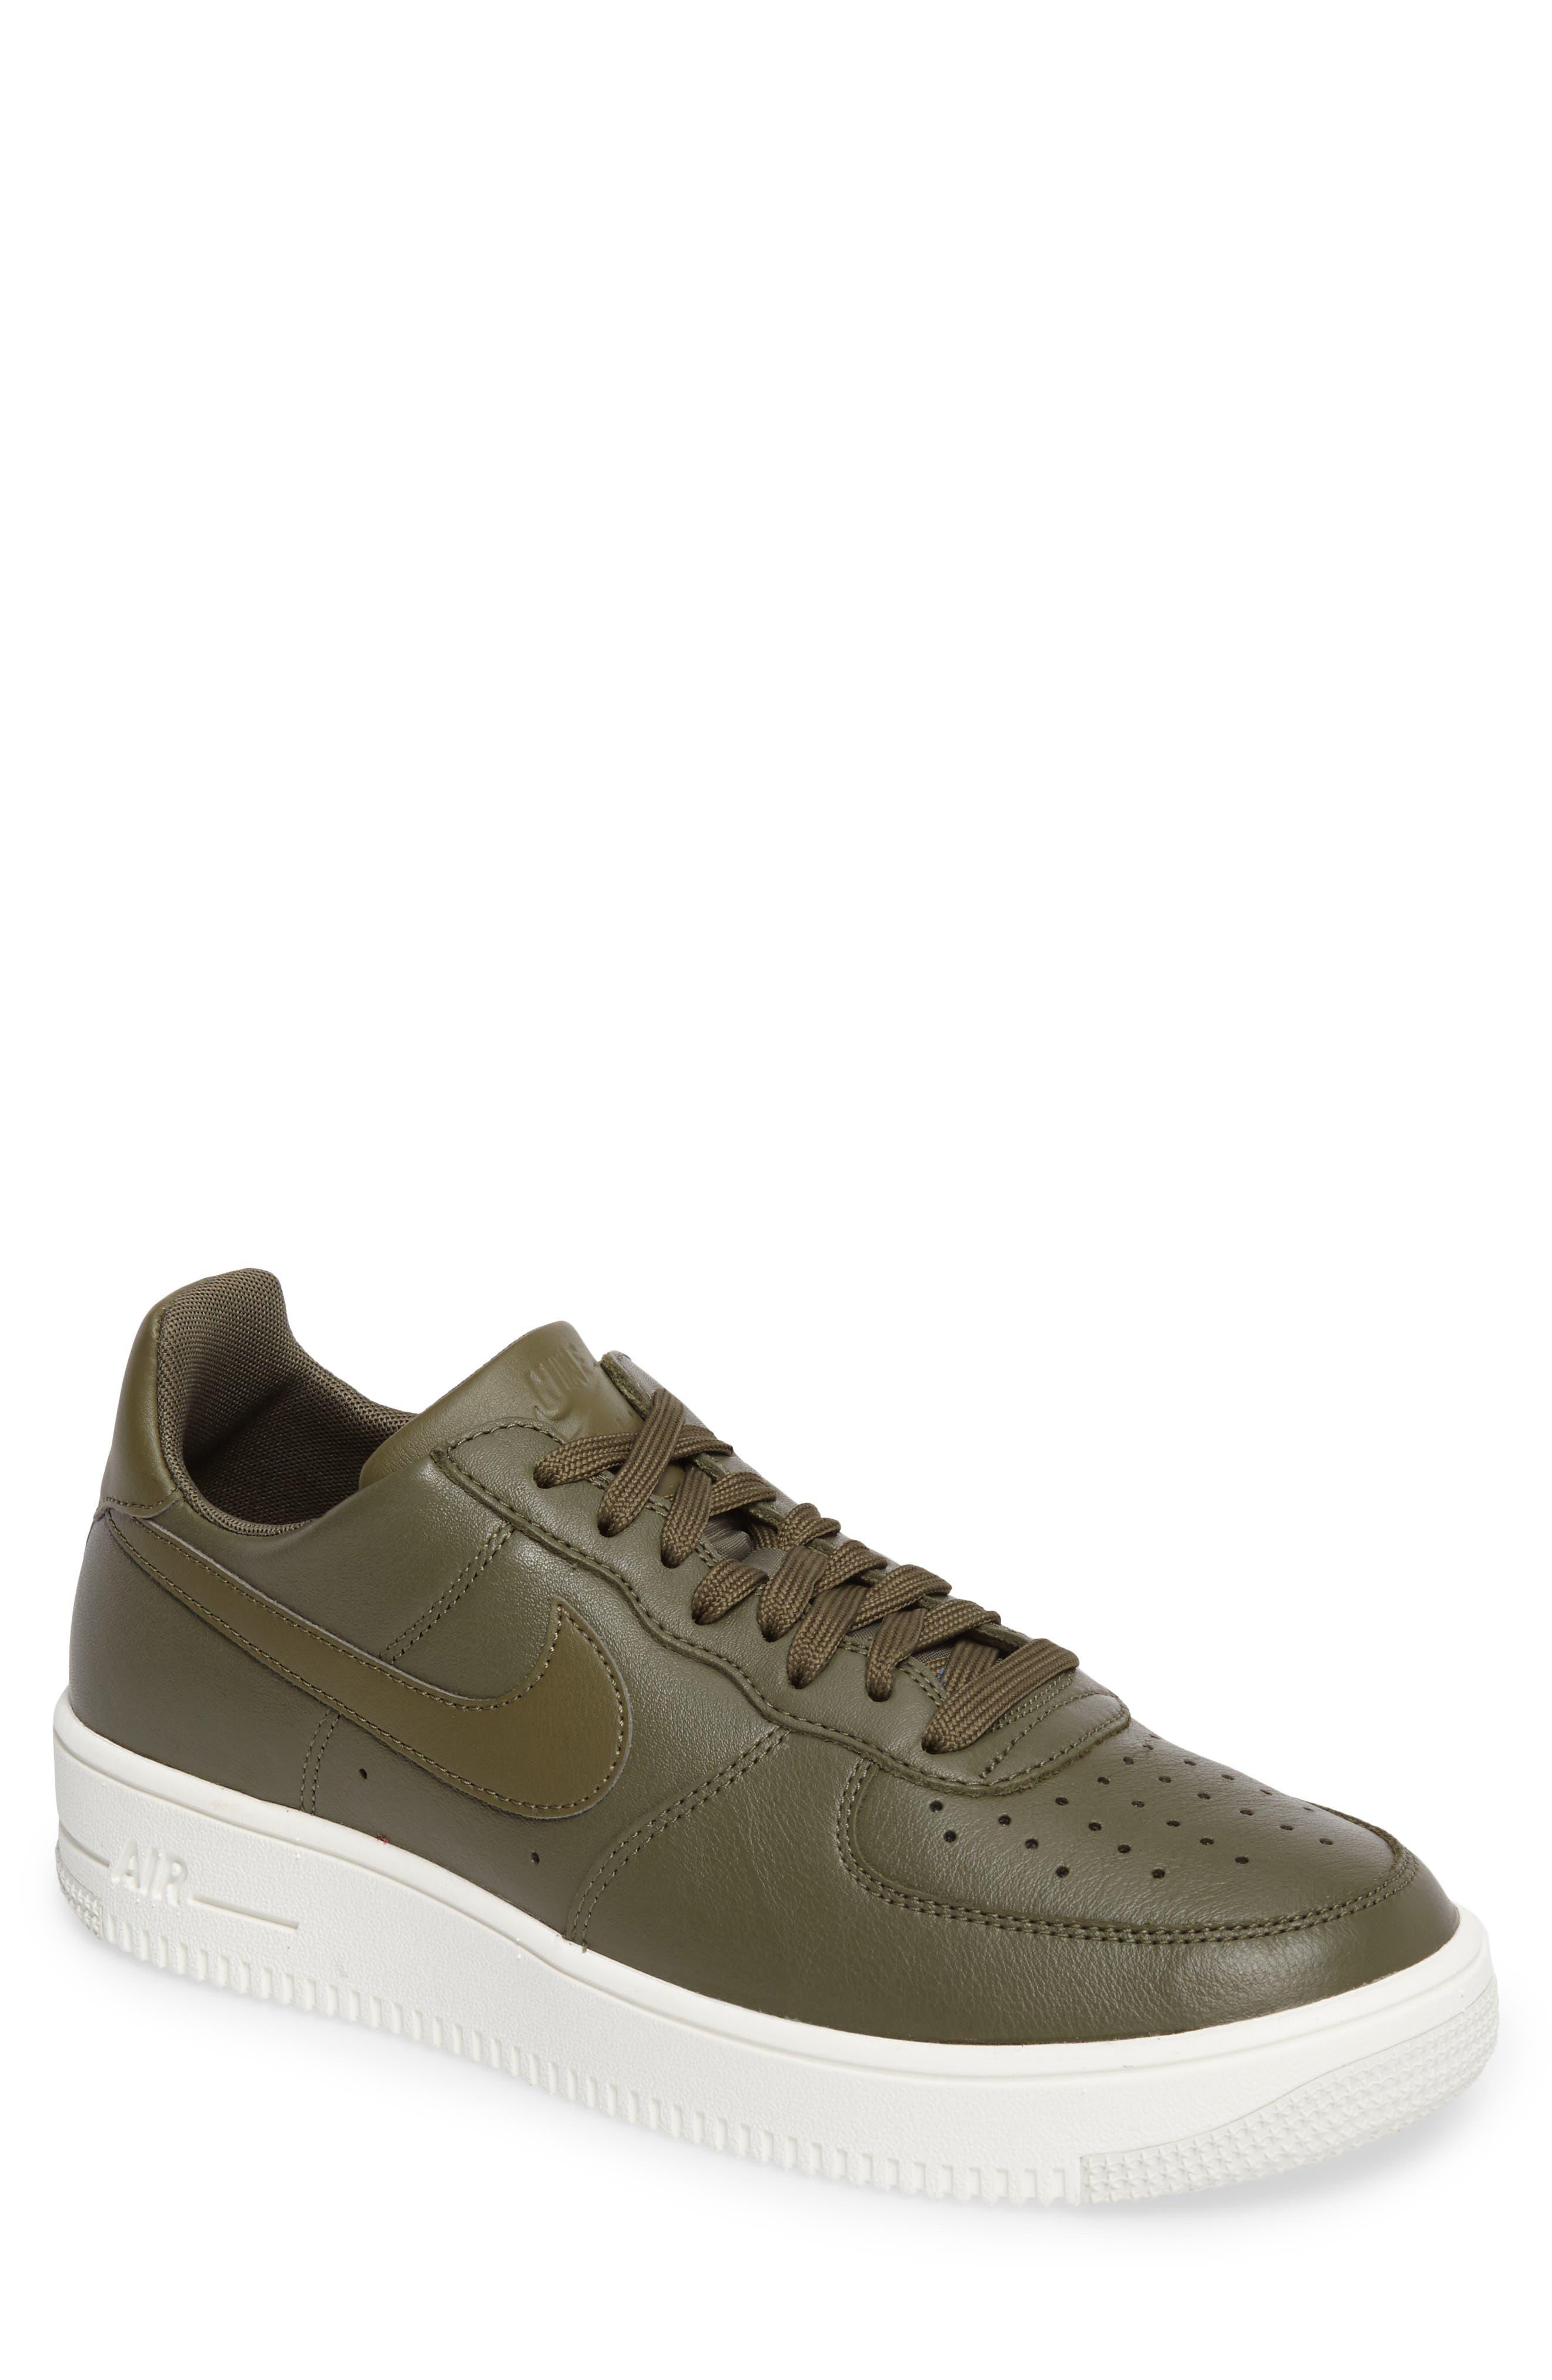 Air Force 1 Ultraforce Sneaker,                             Main thumbnail 4, color,